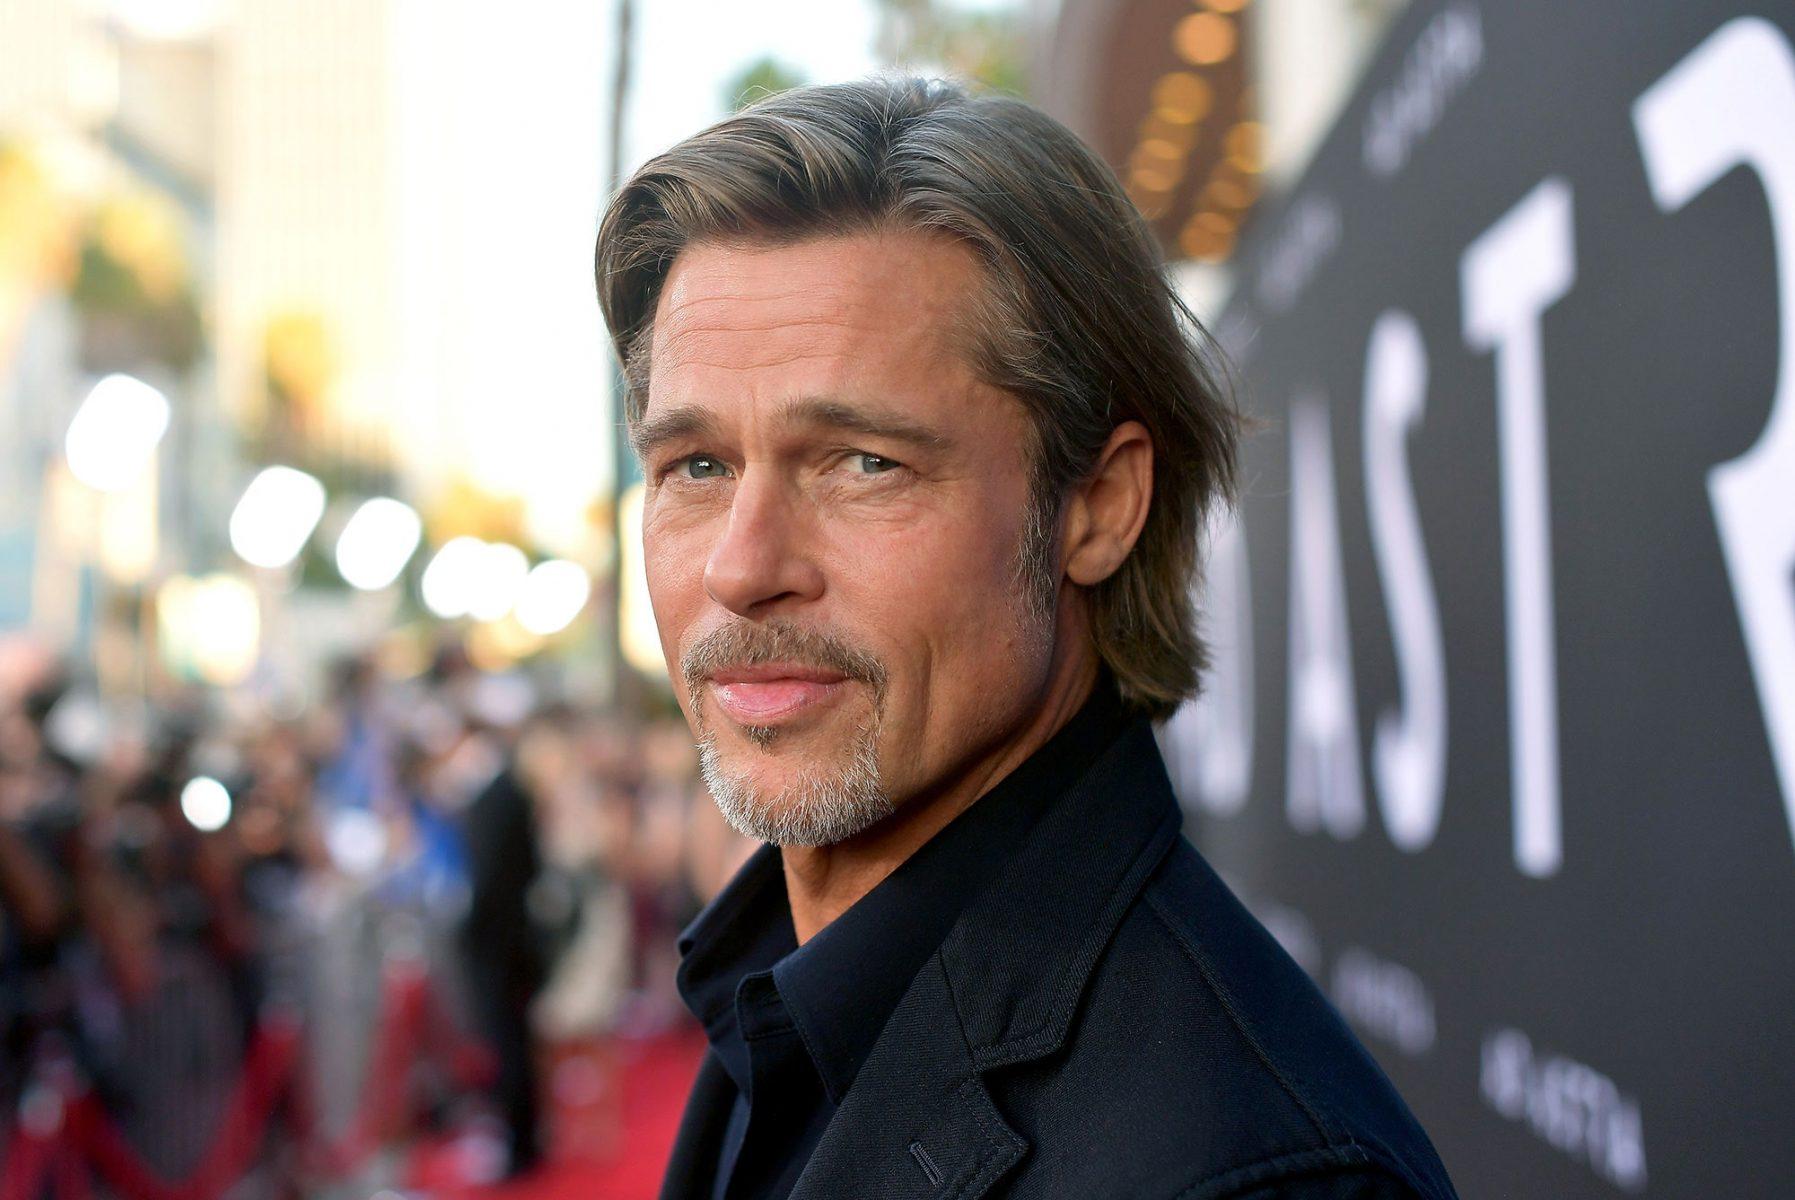 Brad Pitt: Χριστούγεννα θα είναι με τα παιδιά του παρά το δύσκολο διαζύγιο με τη Jolie,